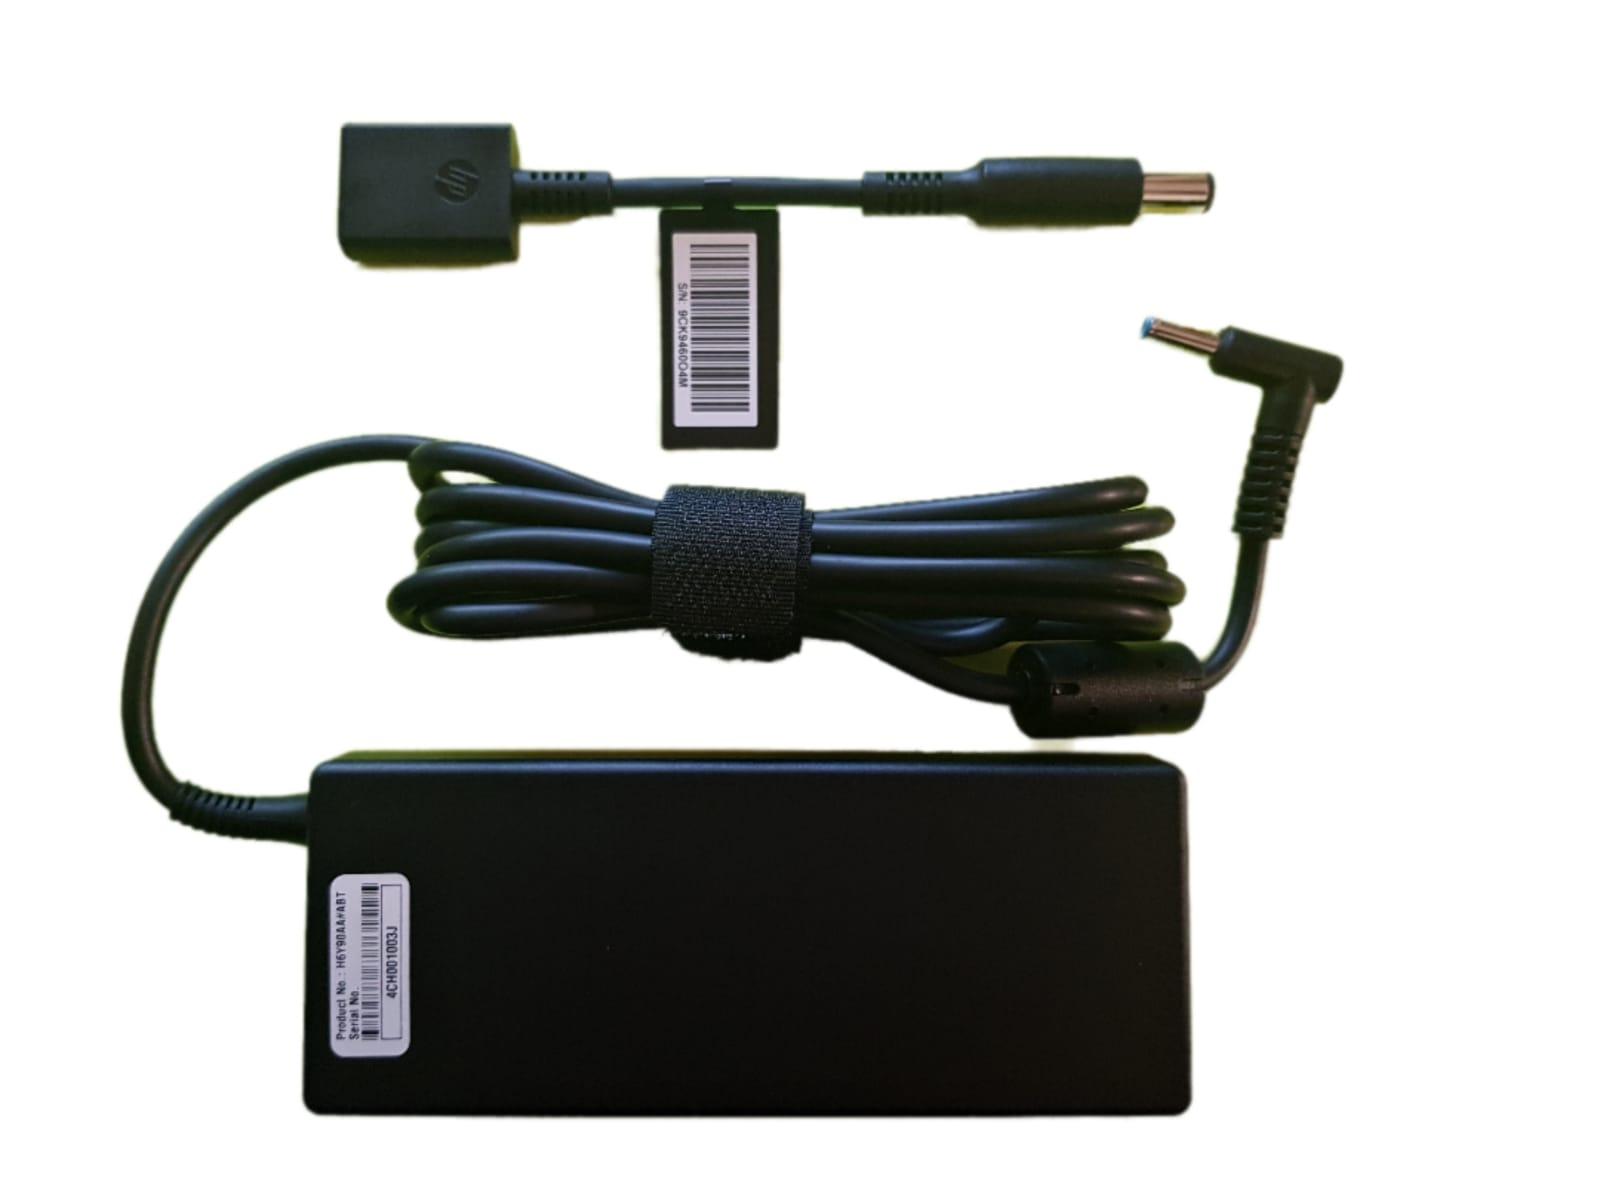 מטען למחשב נייד HP 250 G5 G6 255 G5 250 G4 255 G4 ProBook 450 G3